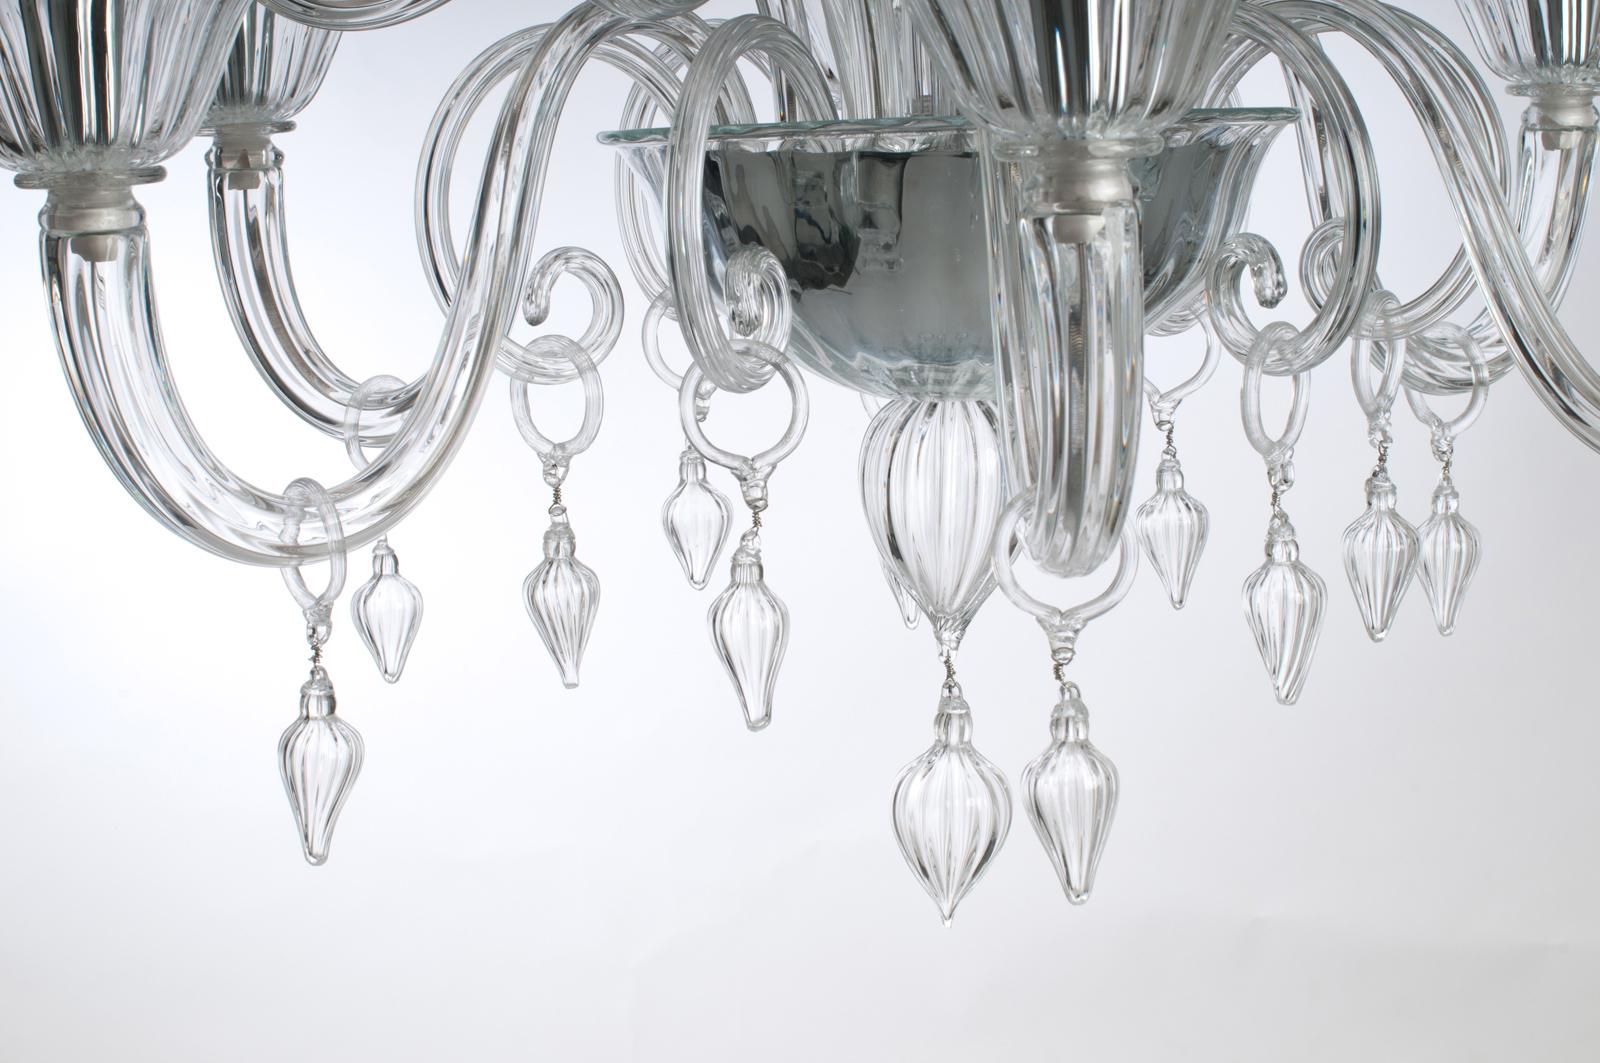 cachemire-lustre-chandelier-veronese-4.jpg